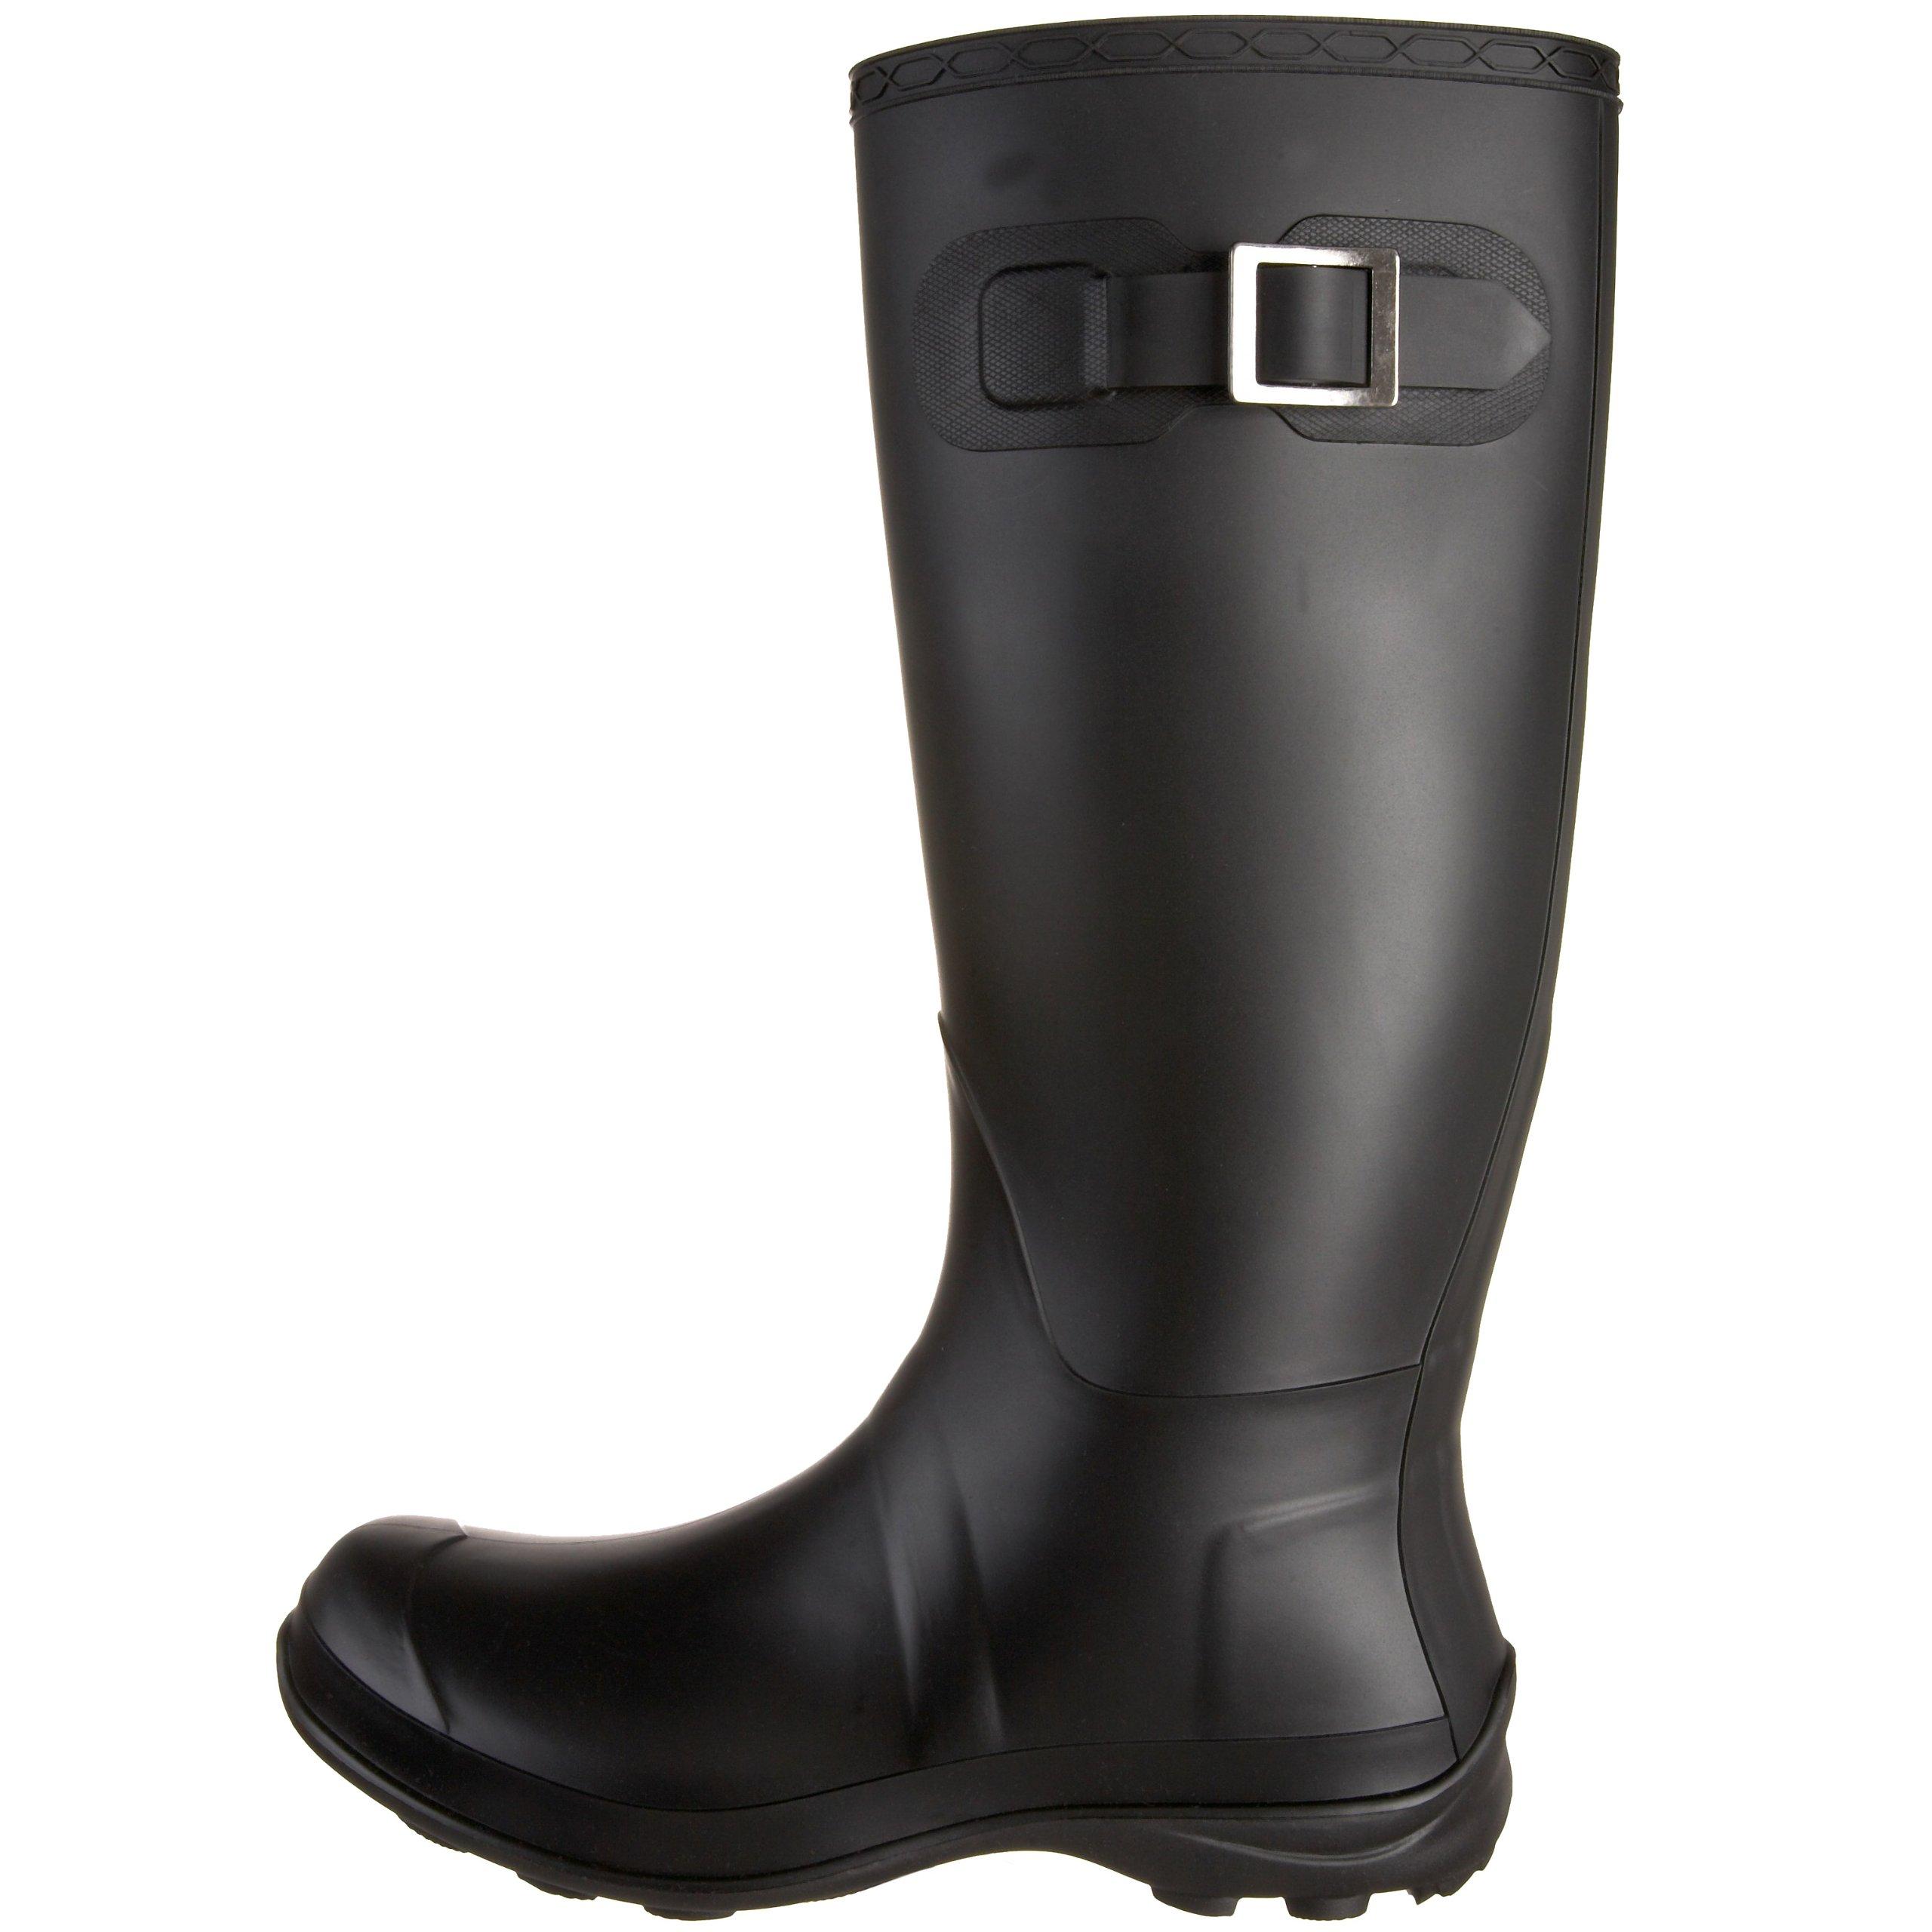 Kamik Women's Olivia Rain Boot,Black,9 M US by Kamik (Image #5)